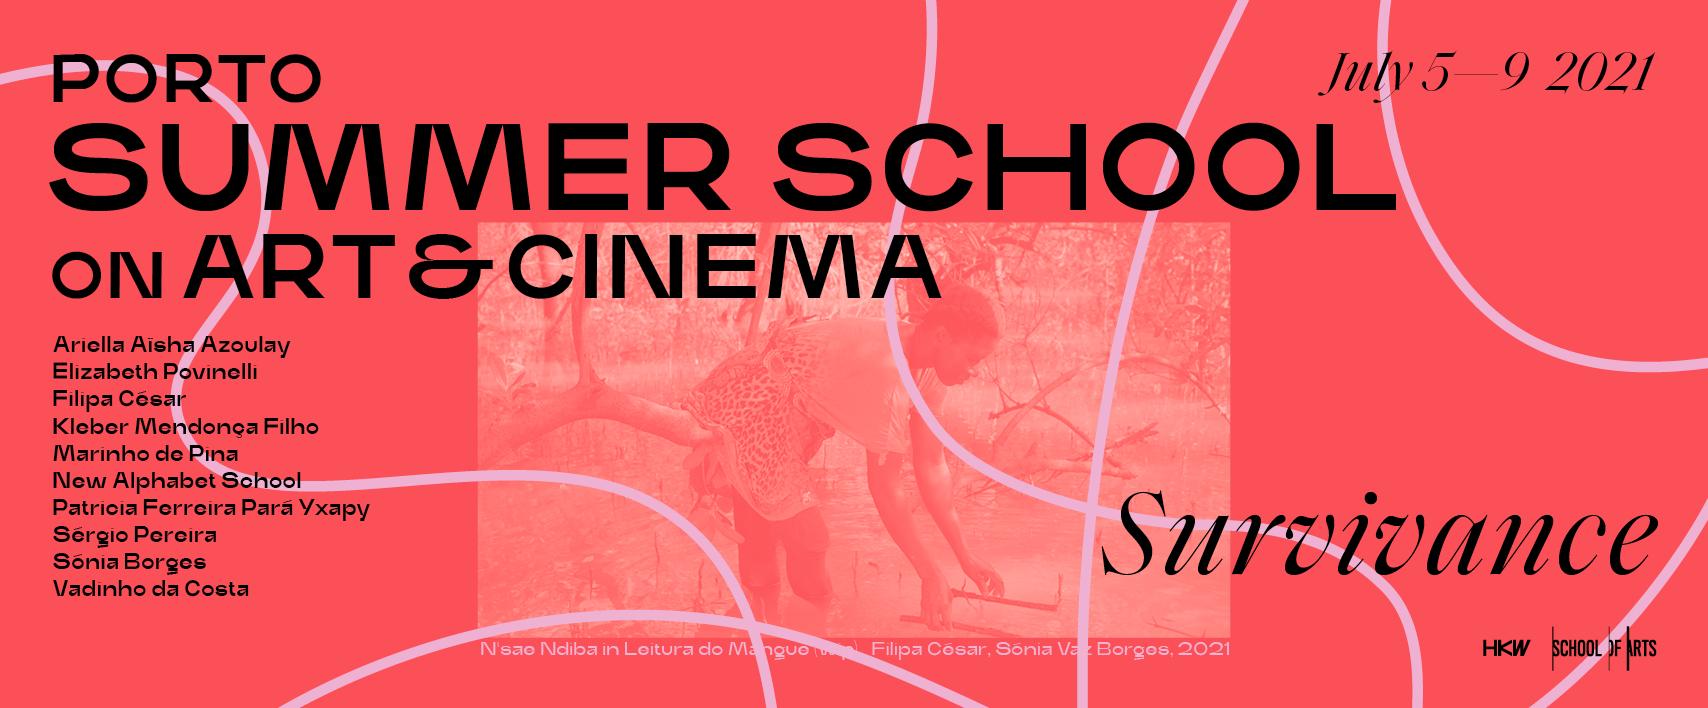 Elizabeth Povinelli · Conferência + Sessão de Cinema